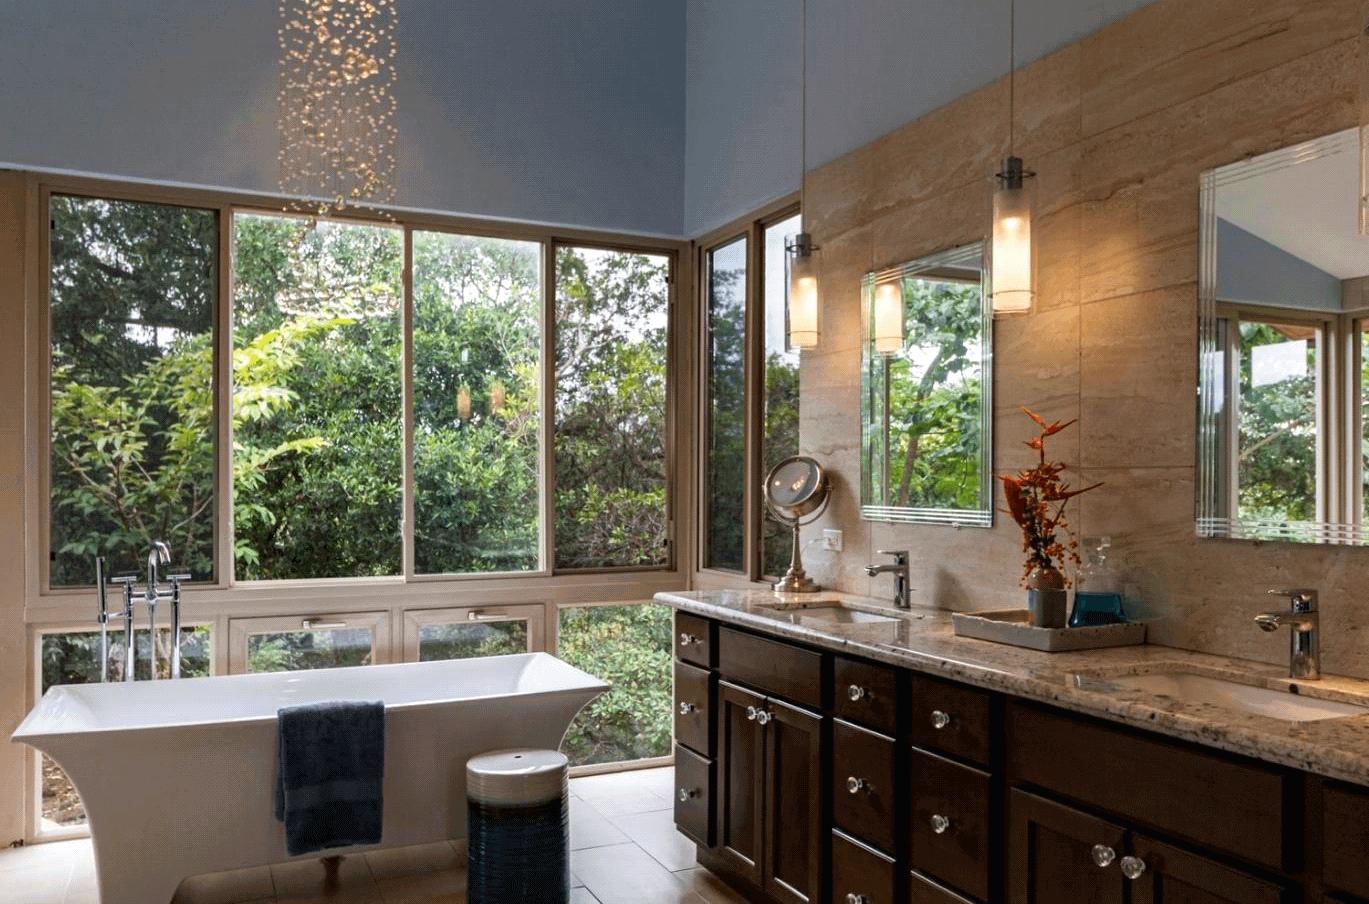 9 Lighting Ideas for Your Bathroom Design- Use Task Lighting